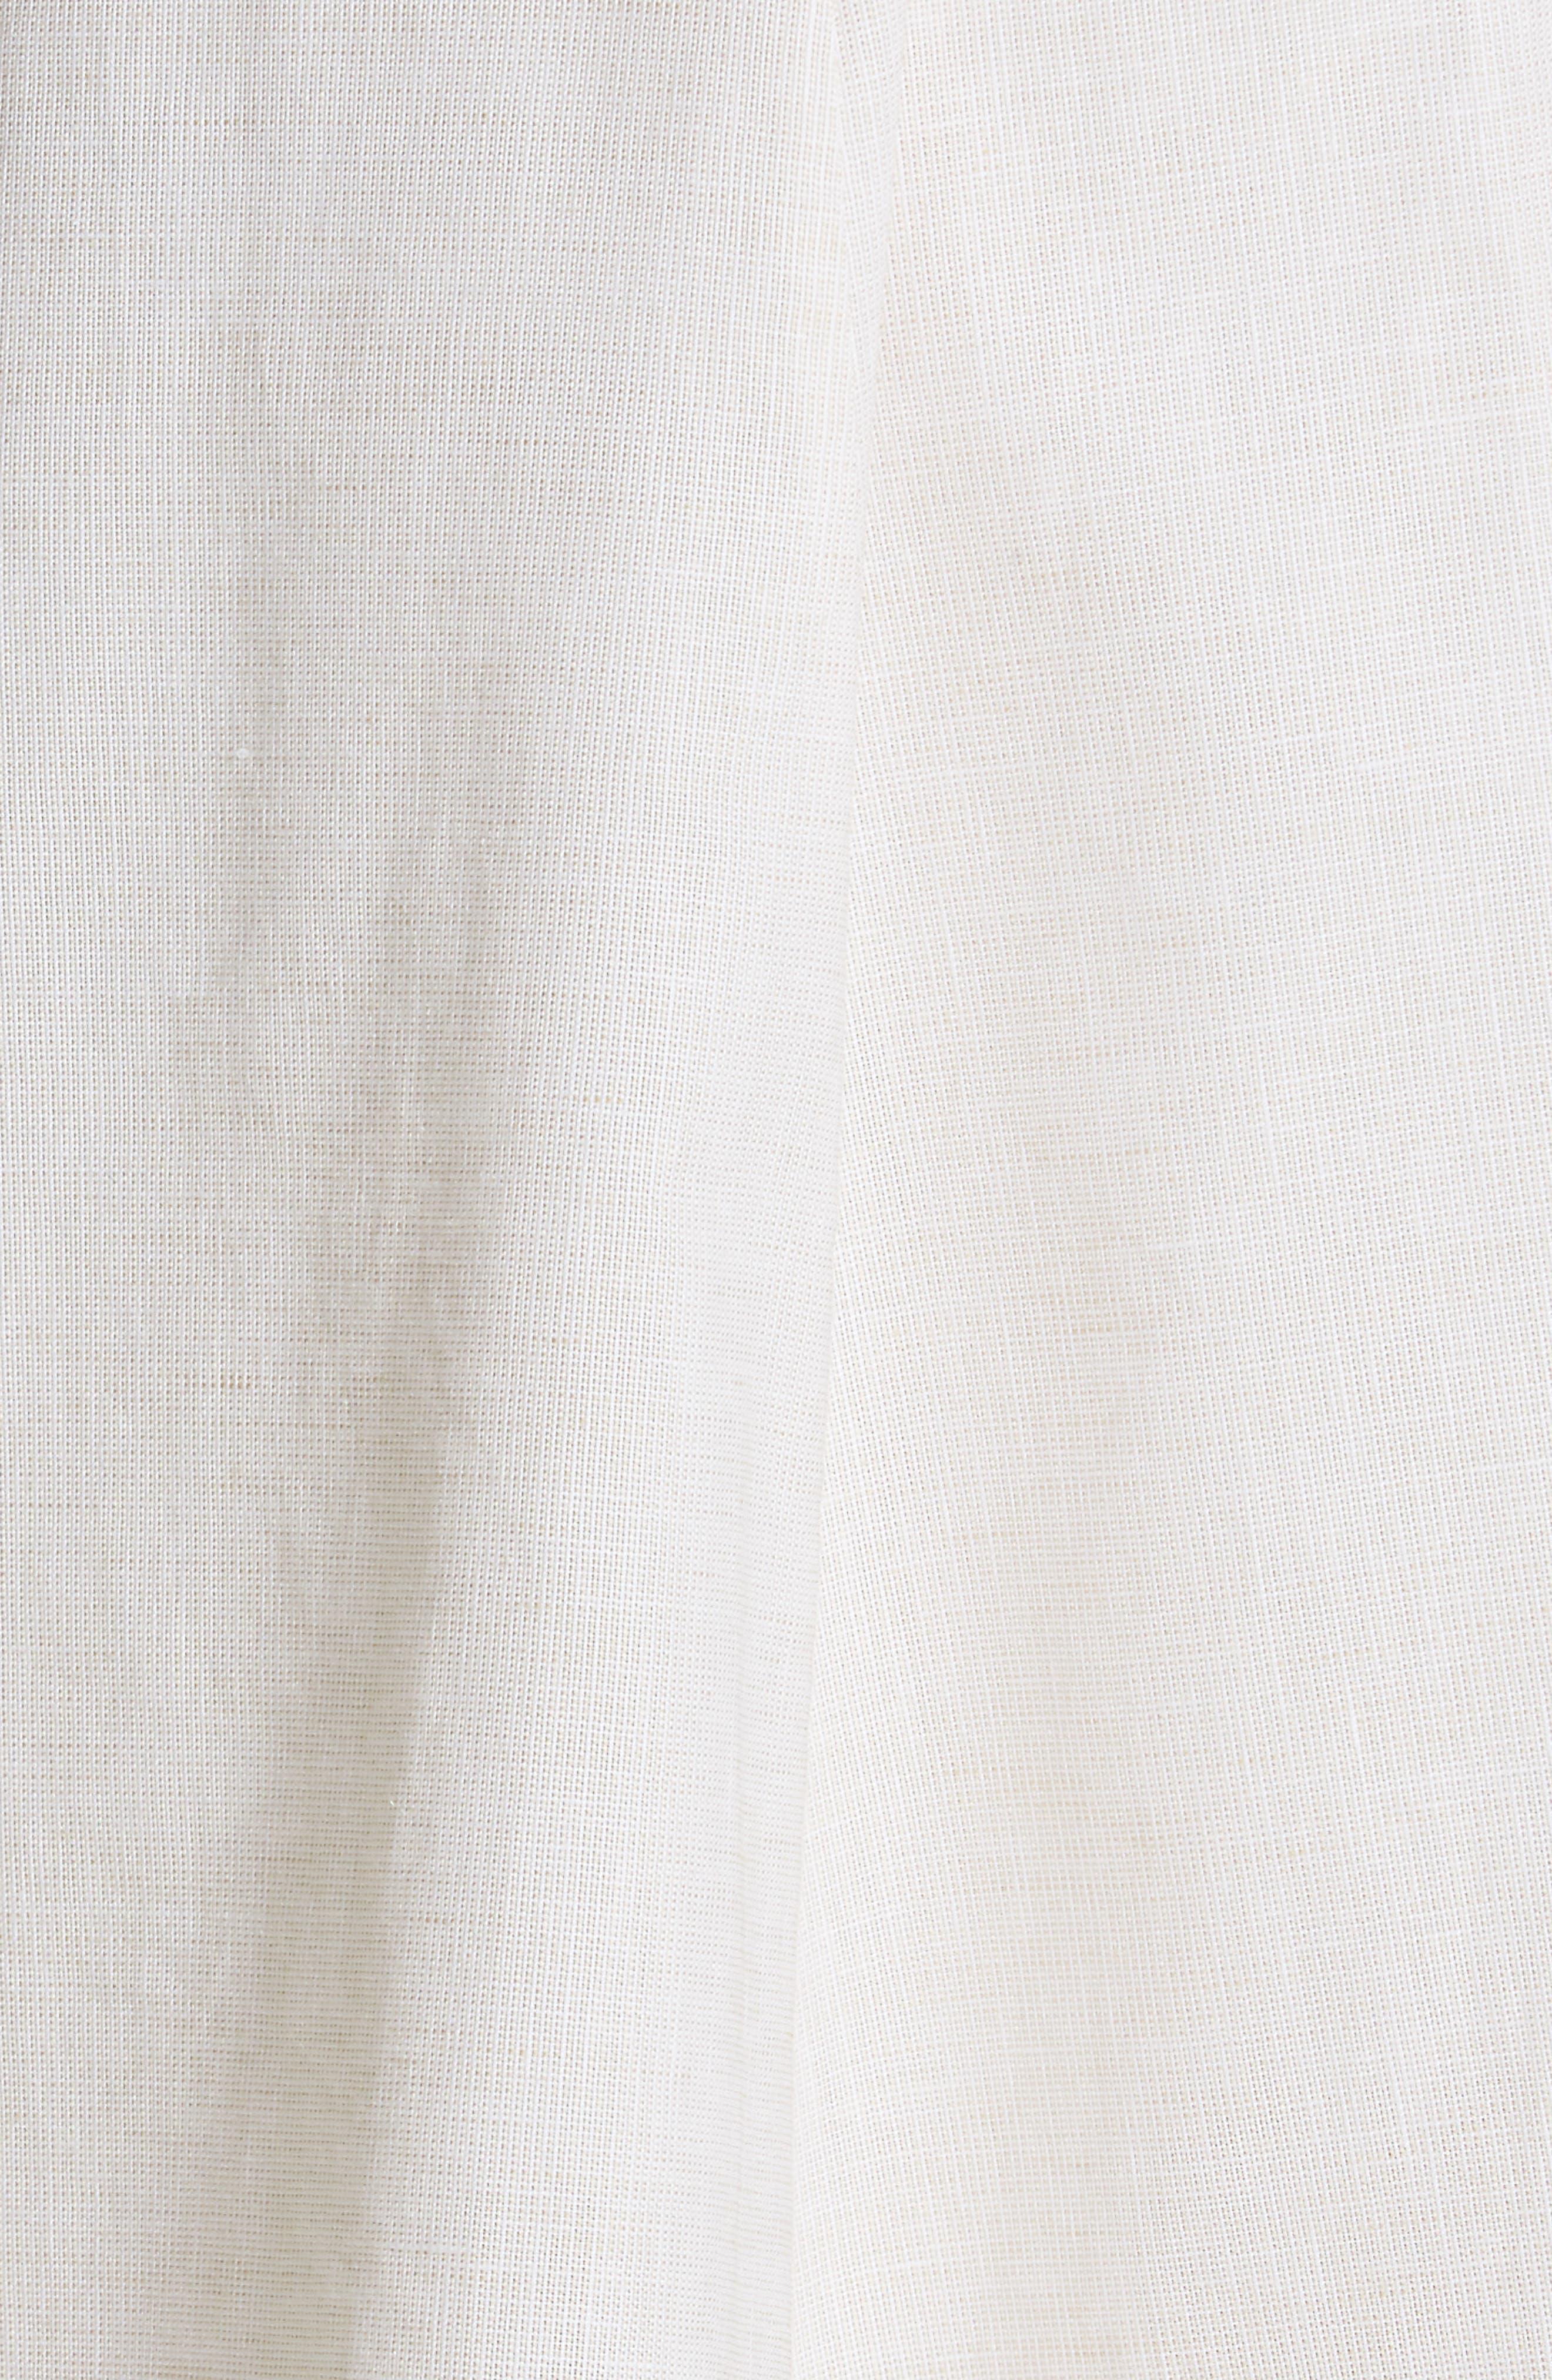 JONATHAN SIMKHAI,                             Off the Shoulder Cotton & Linen Dress,                             Alternate thumbnail 5, color,                             ECRU